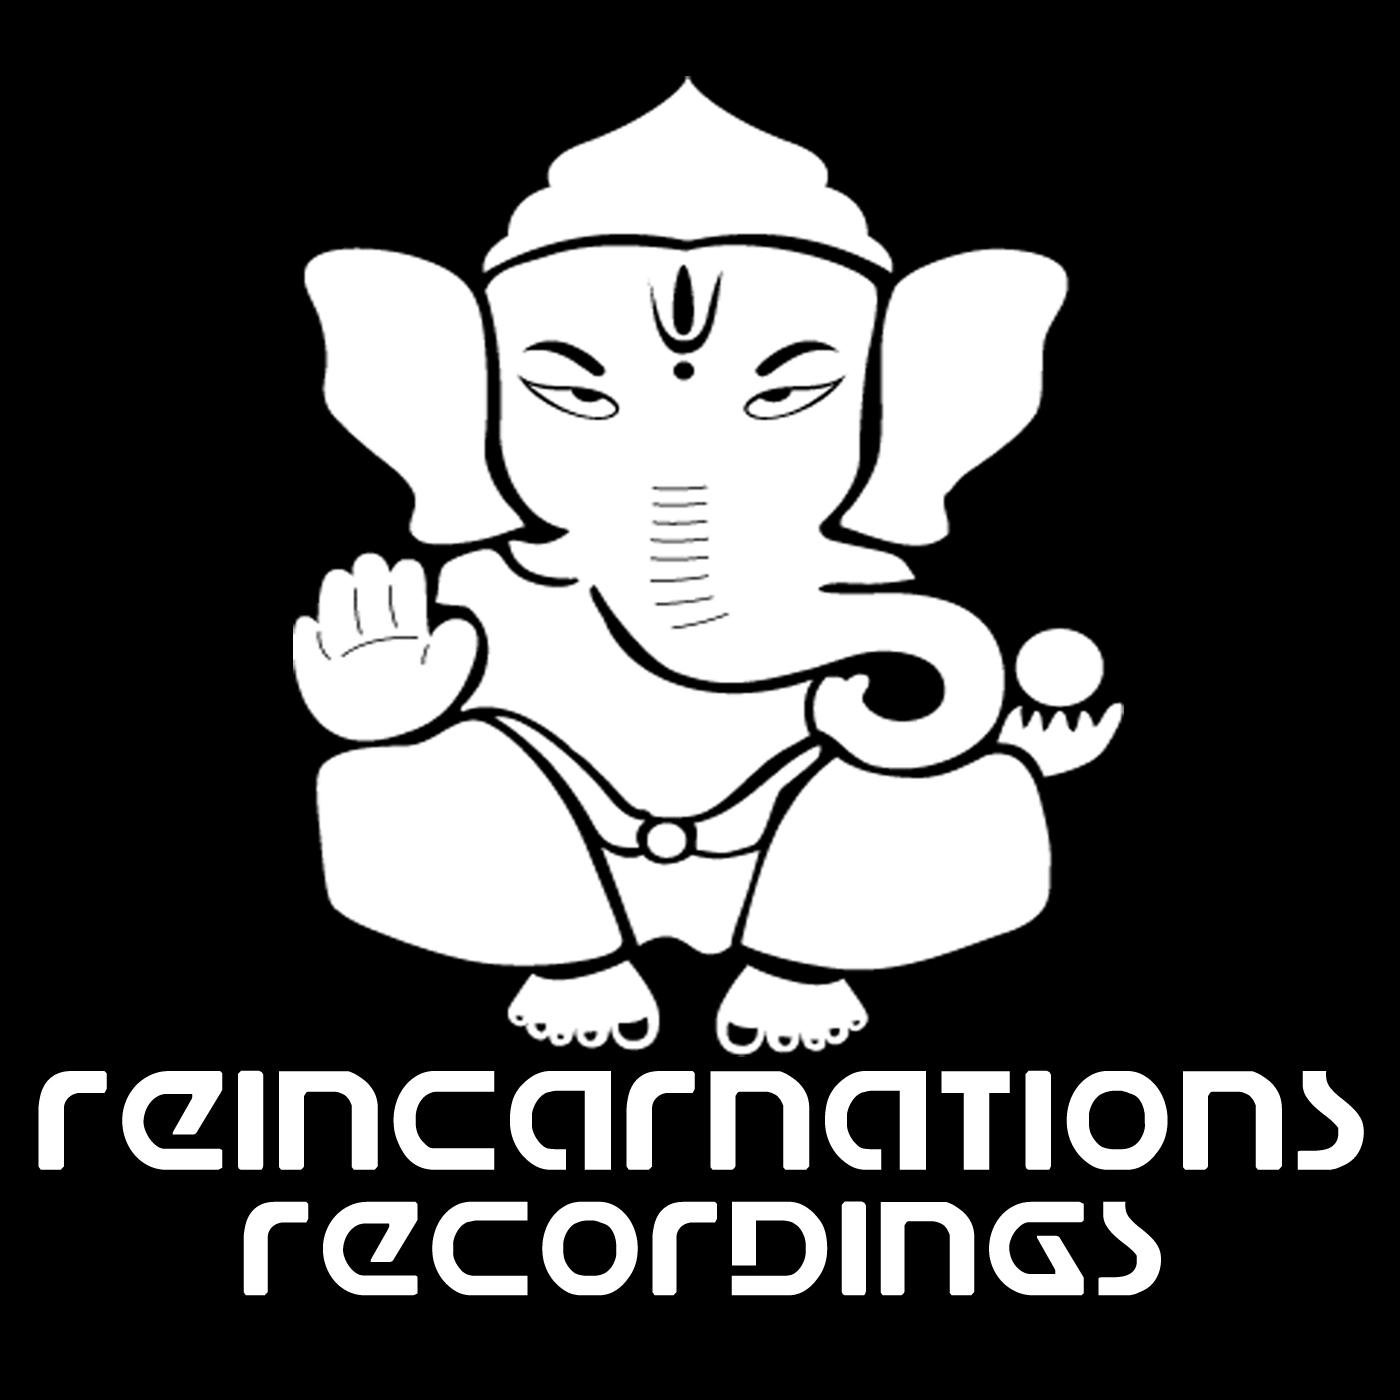 Pan – 'Pixel Pusher' out 8/4/19 on Reincarnations Recordings!